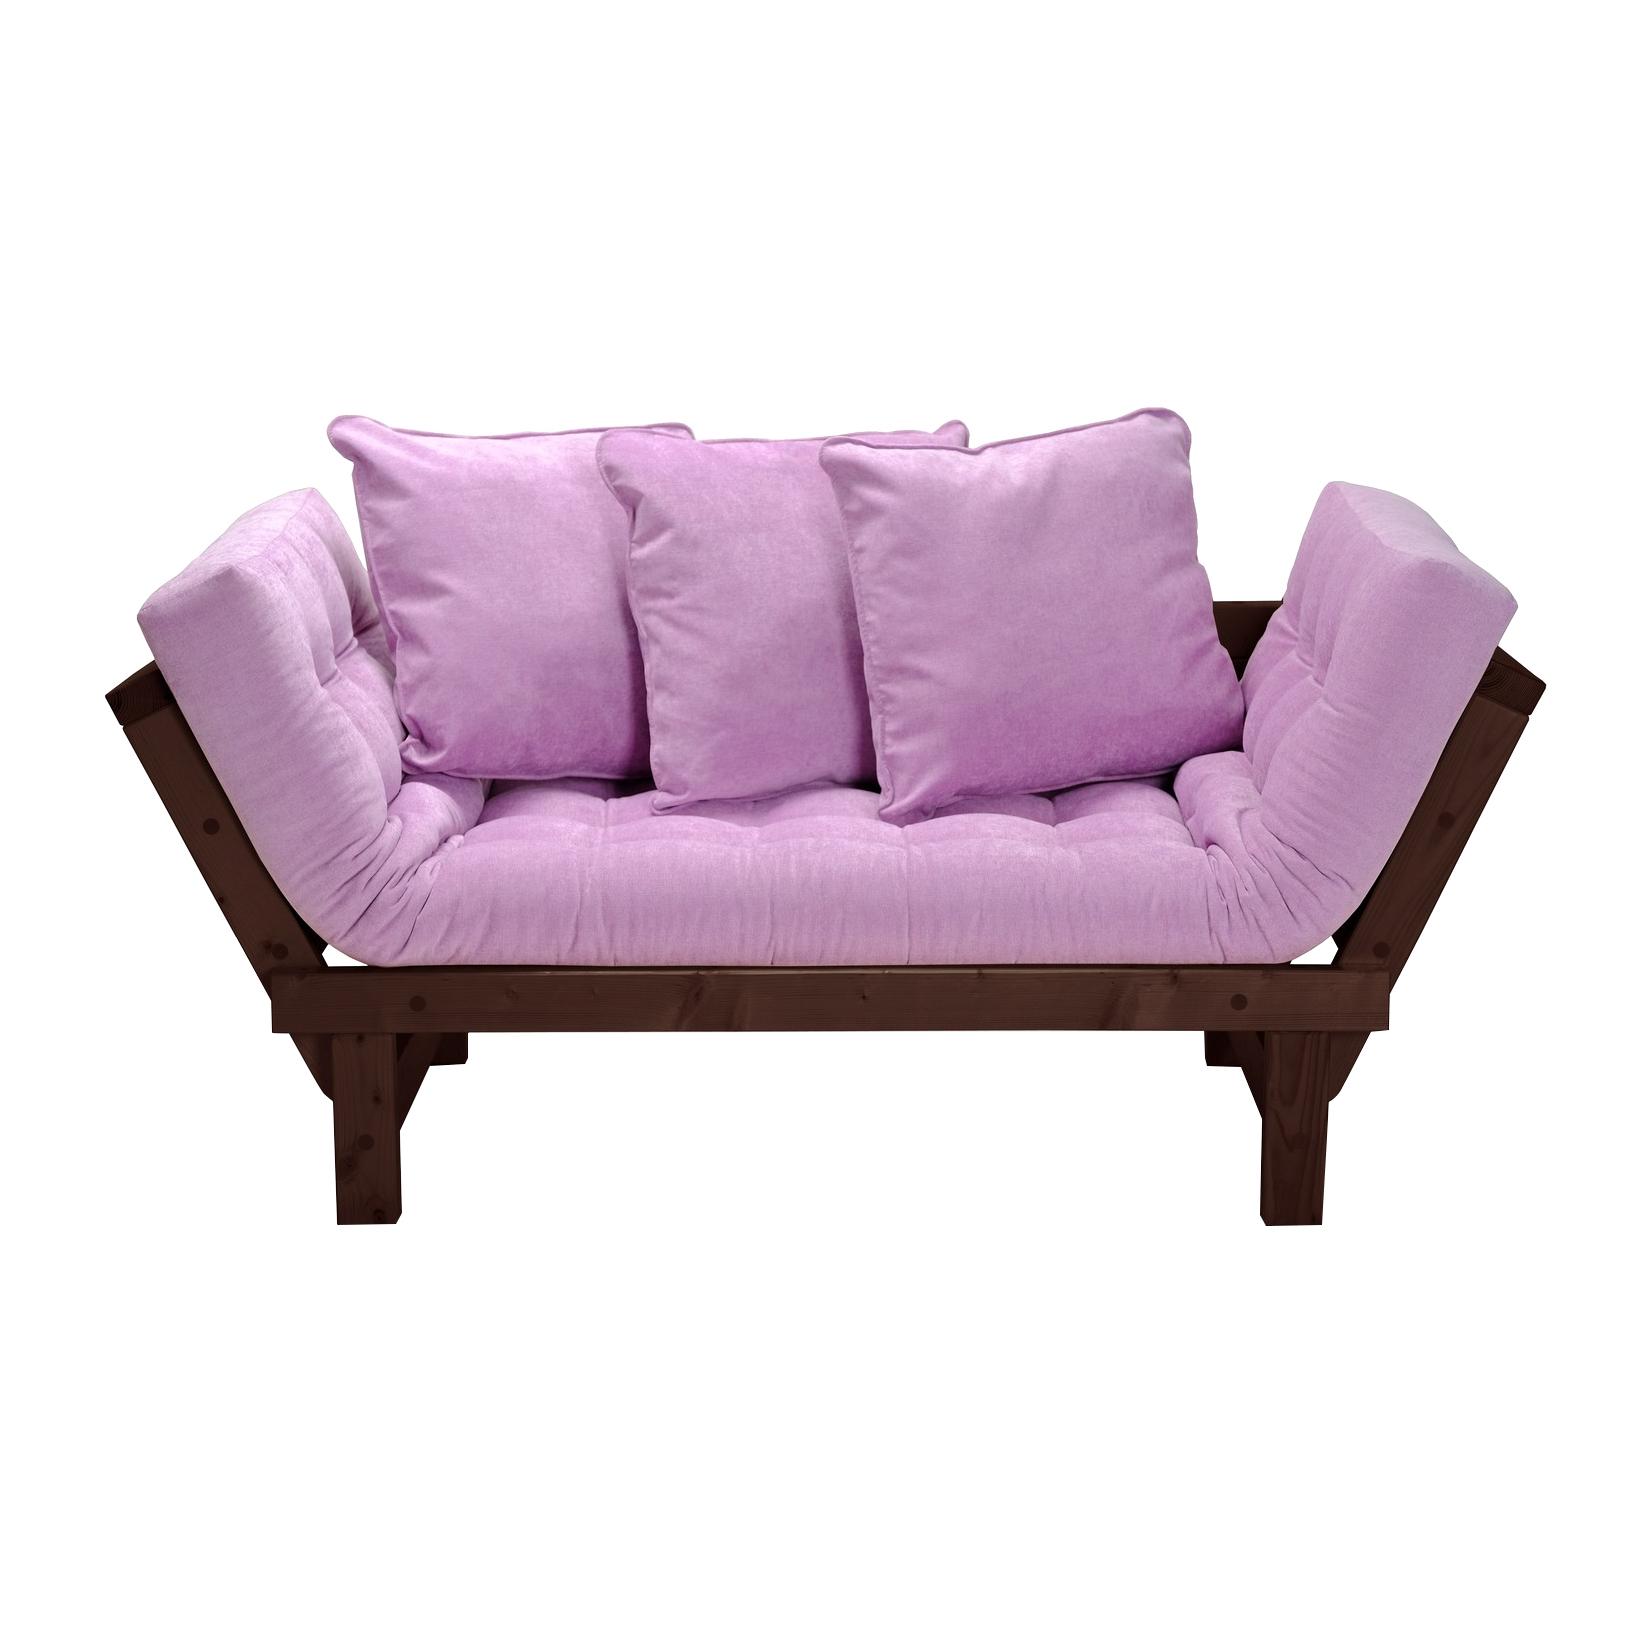 Кушетка AS Санди 158x77x61 венге/розовый